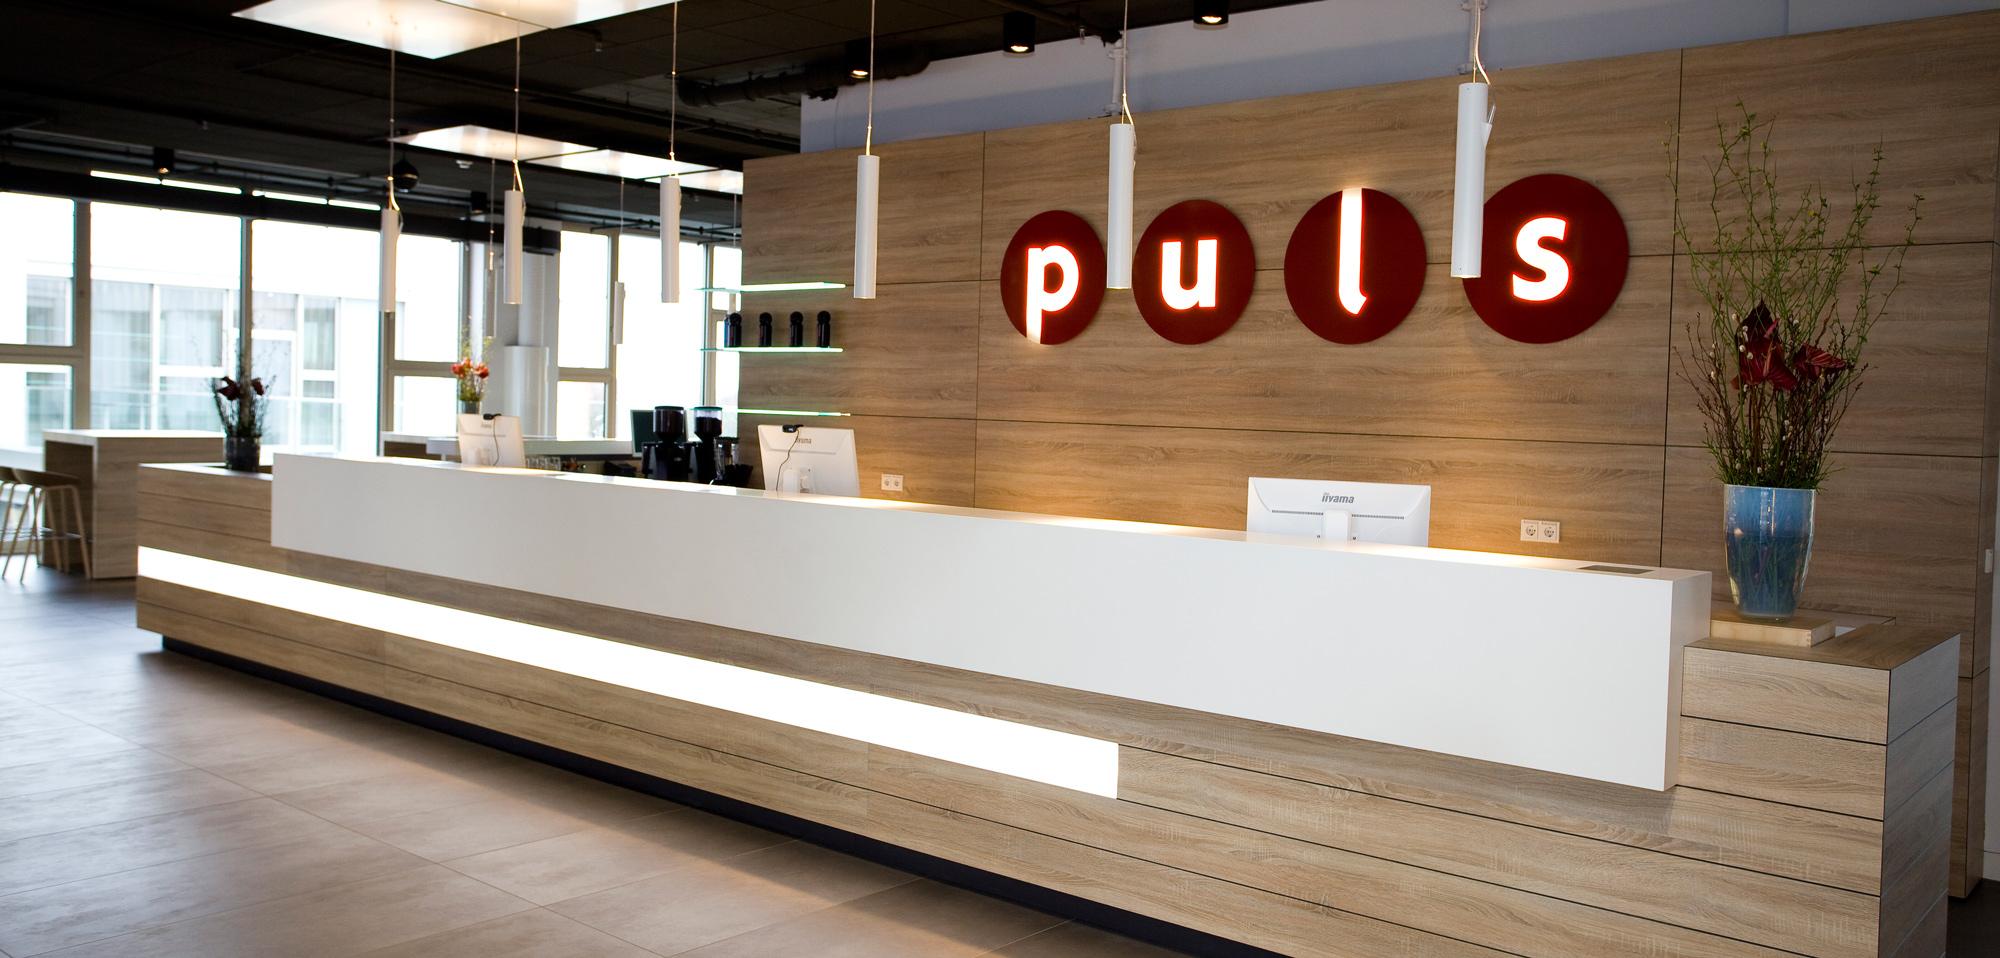 puls fit wellnessclub stuttgart deutschland varicor. Black Bedroom Furniture Sets. Home Design Ideas